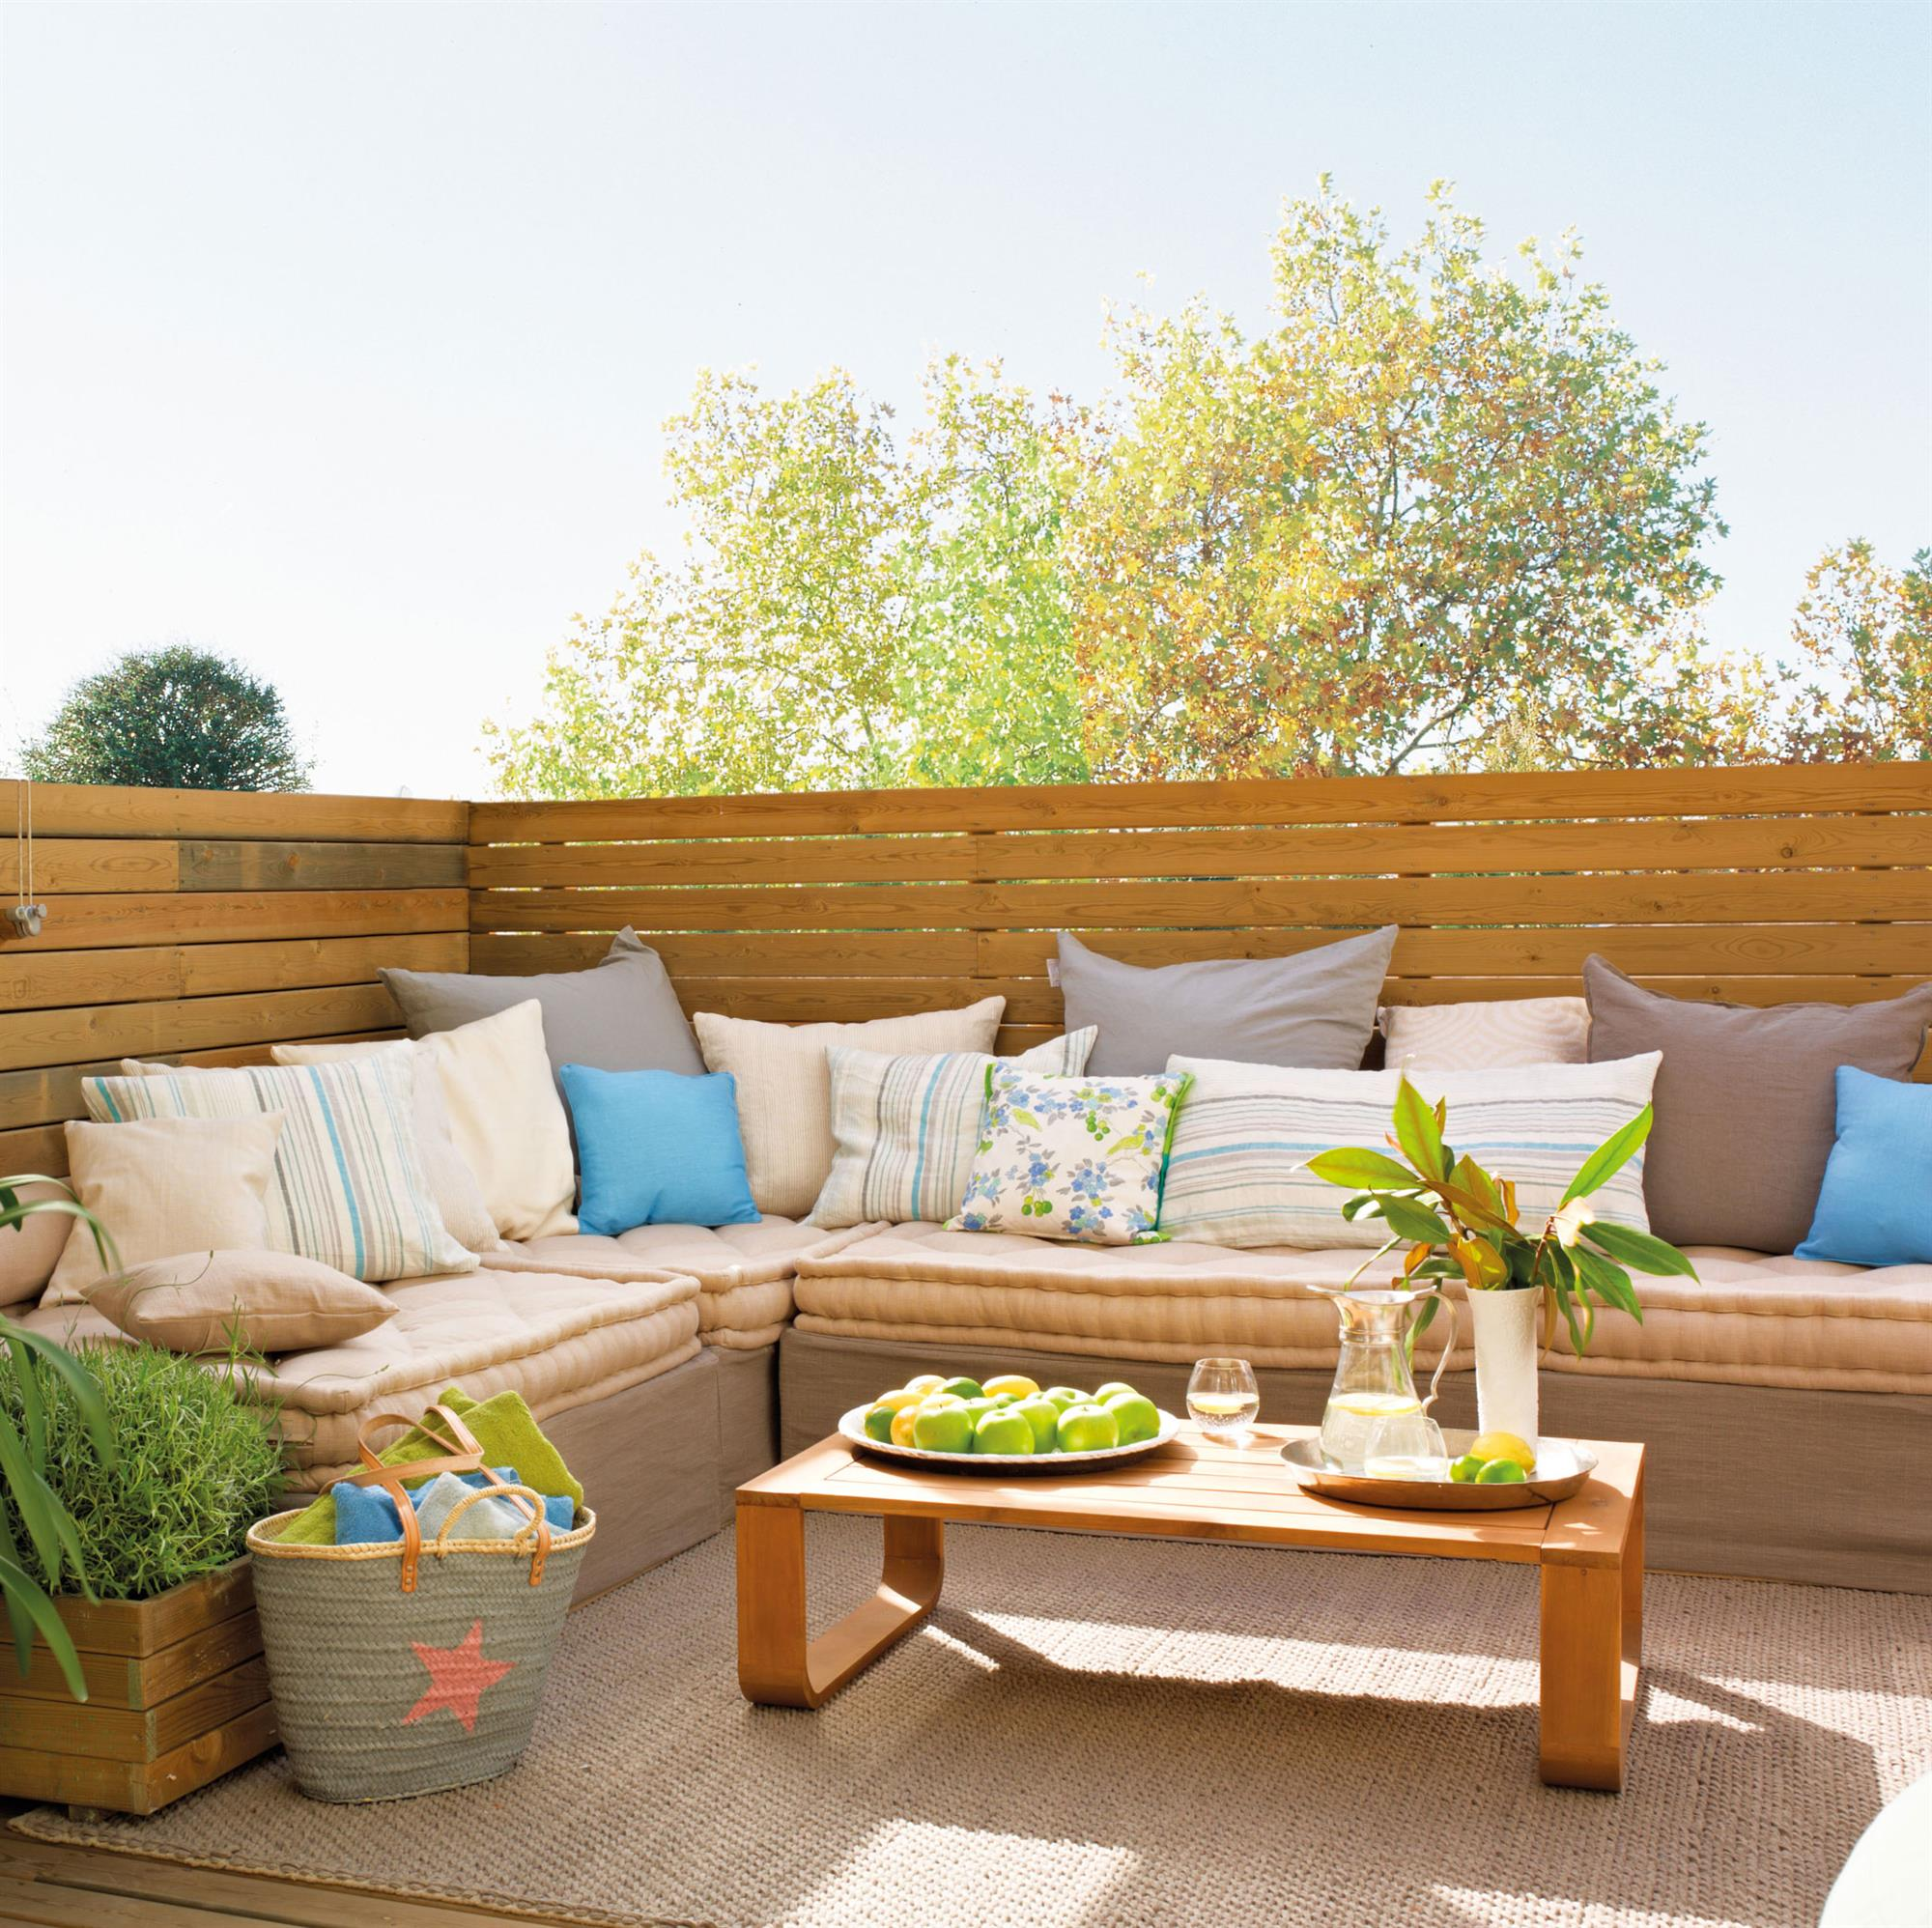 Crear un rinc n chill out en casa Chill out terraza